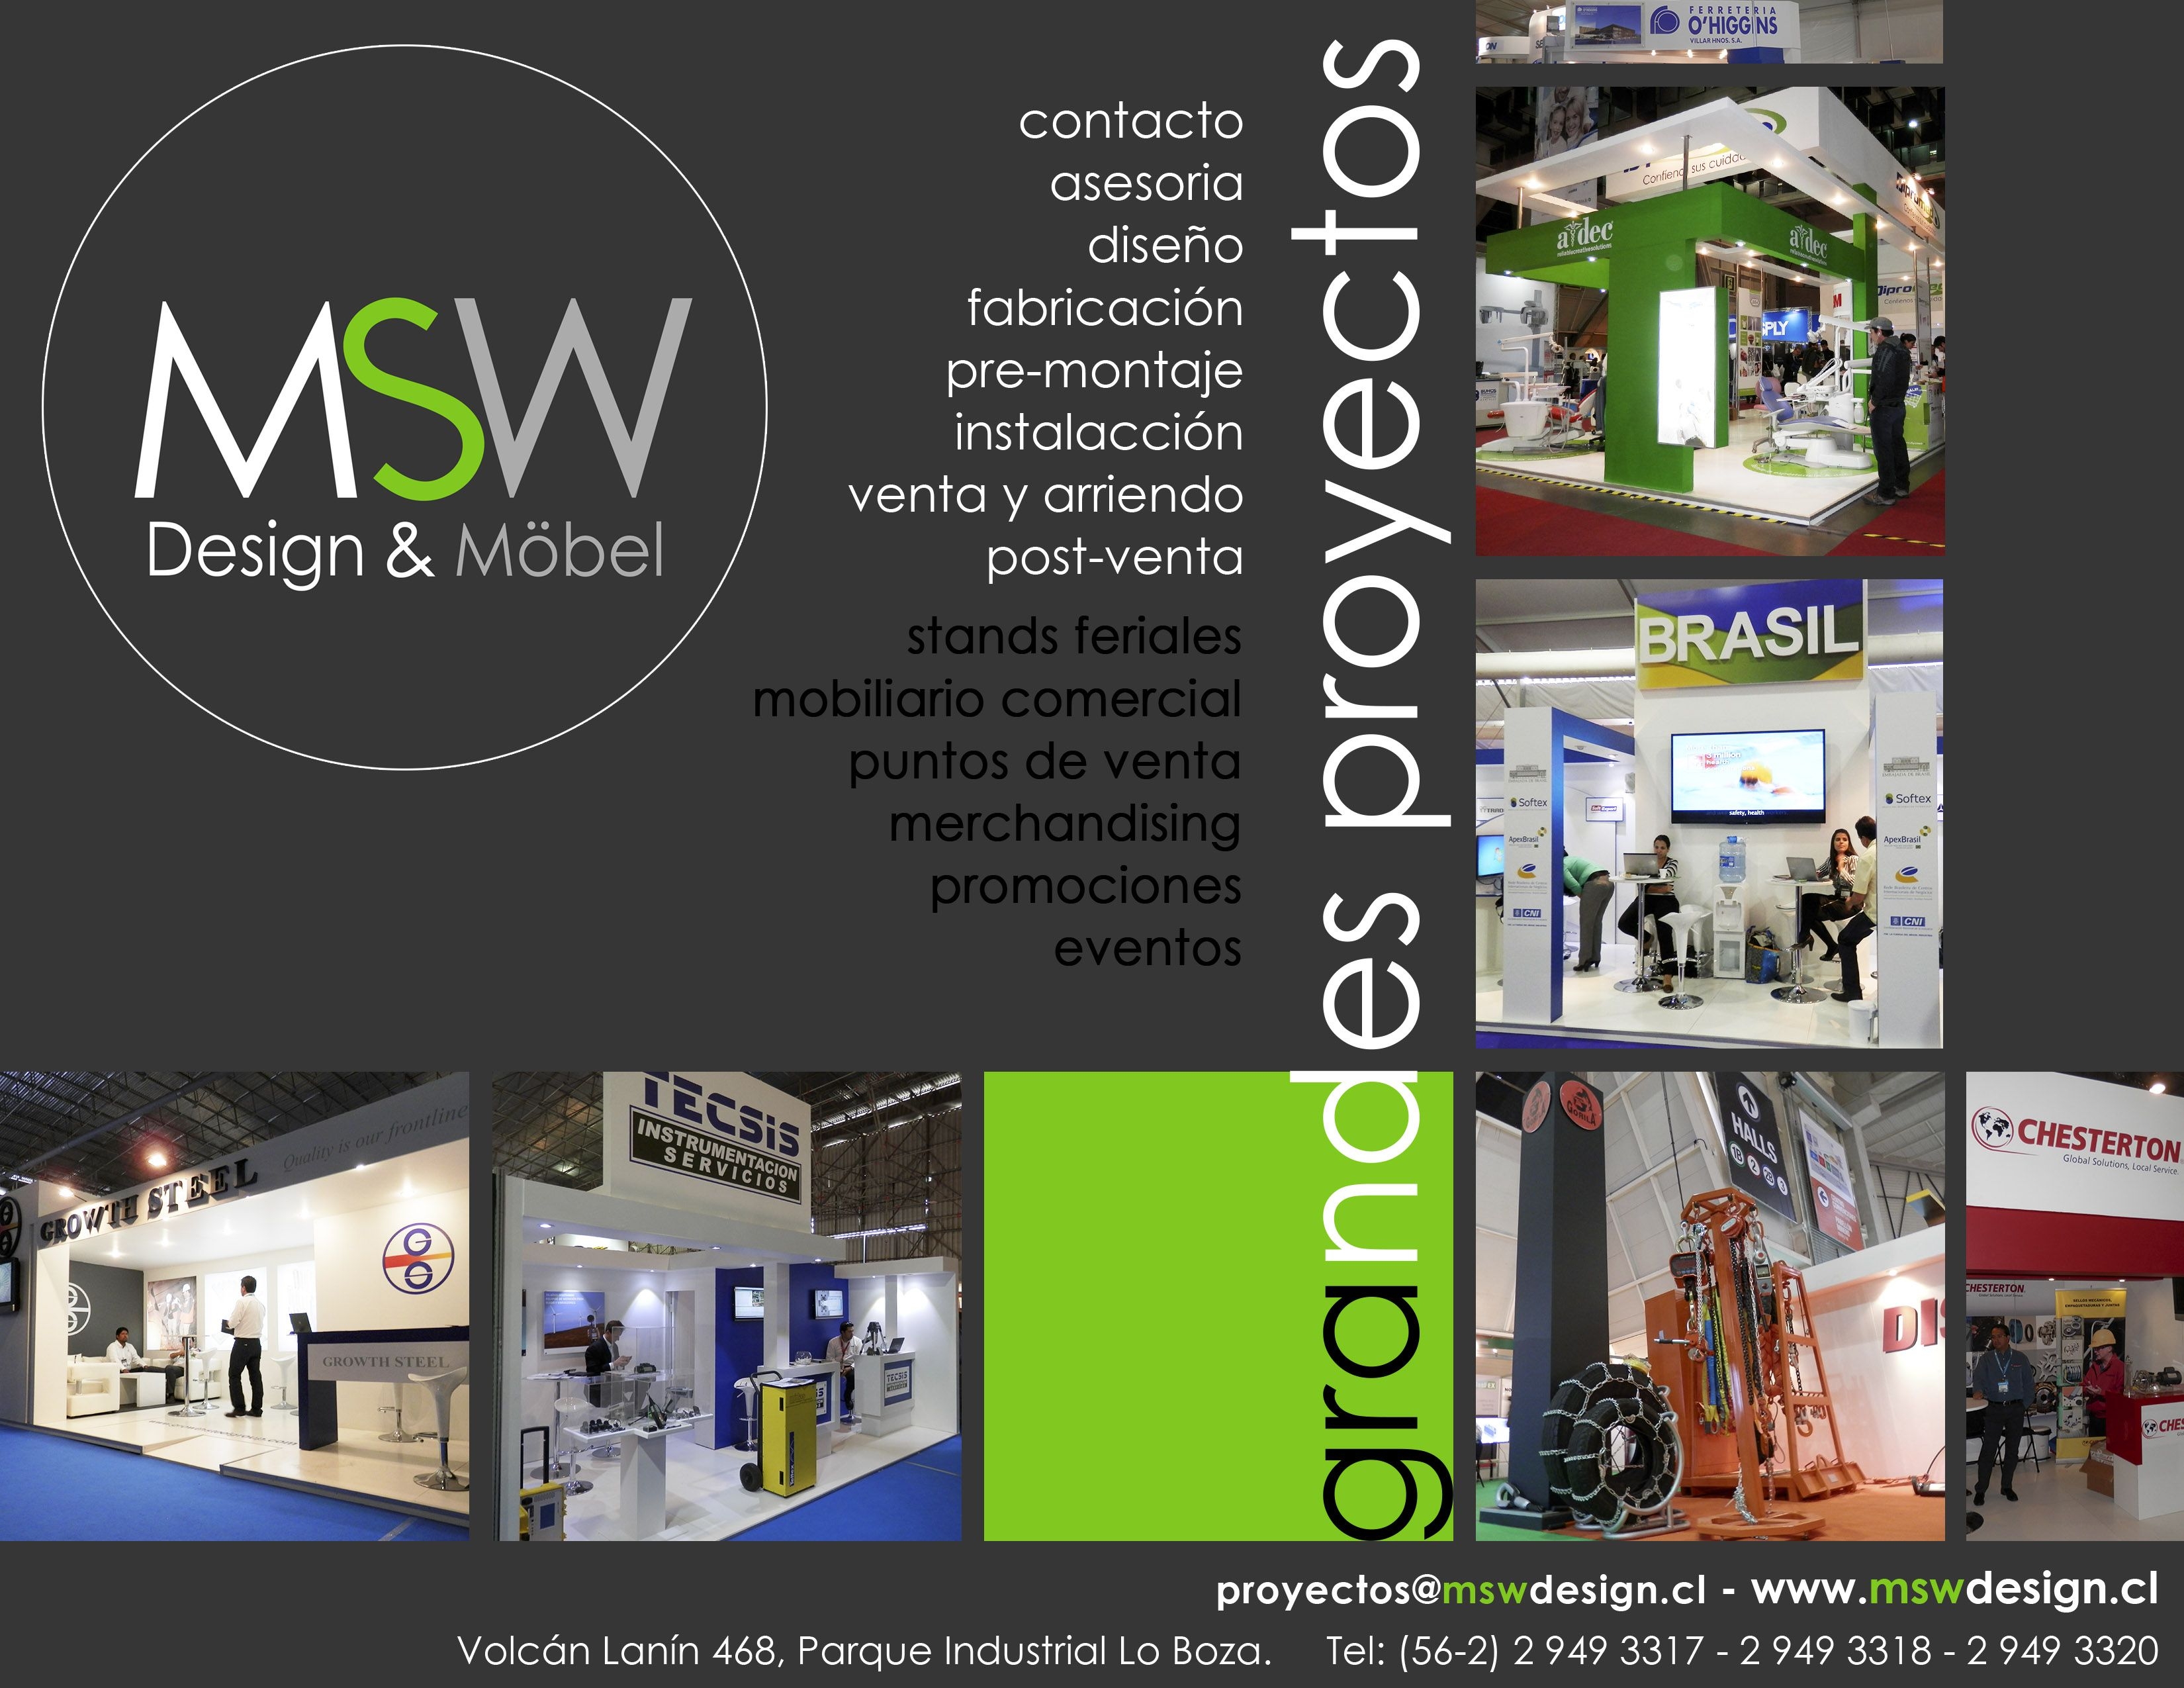 Msw design mobel for Design mobel